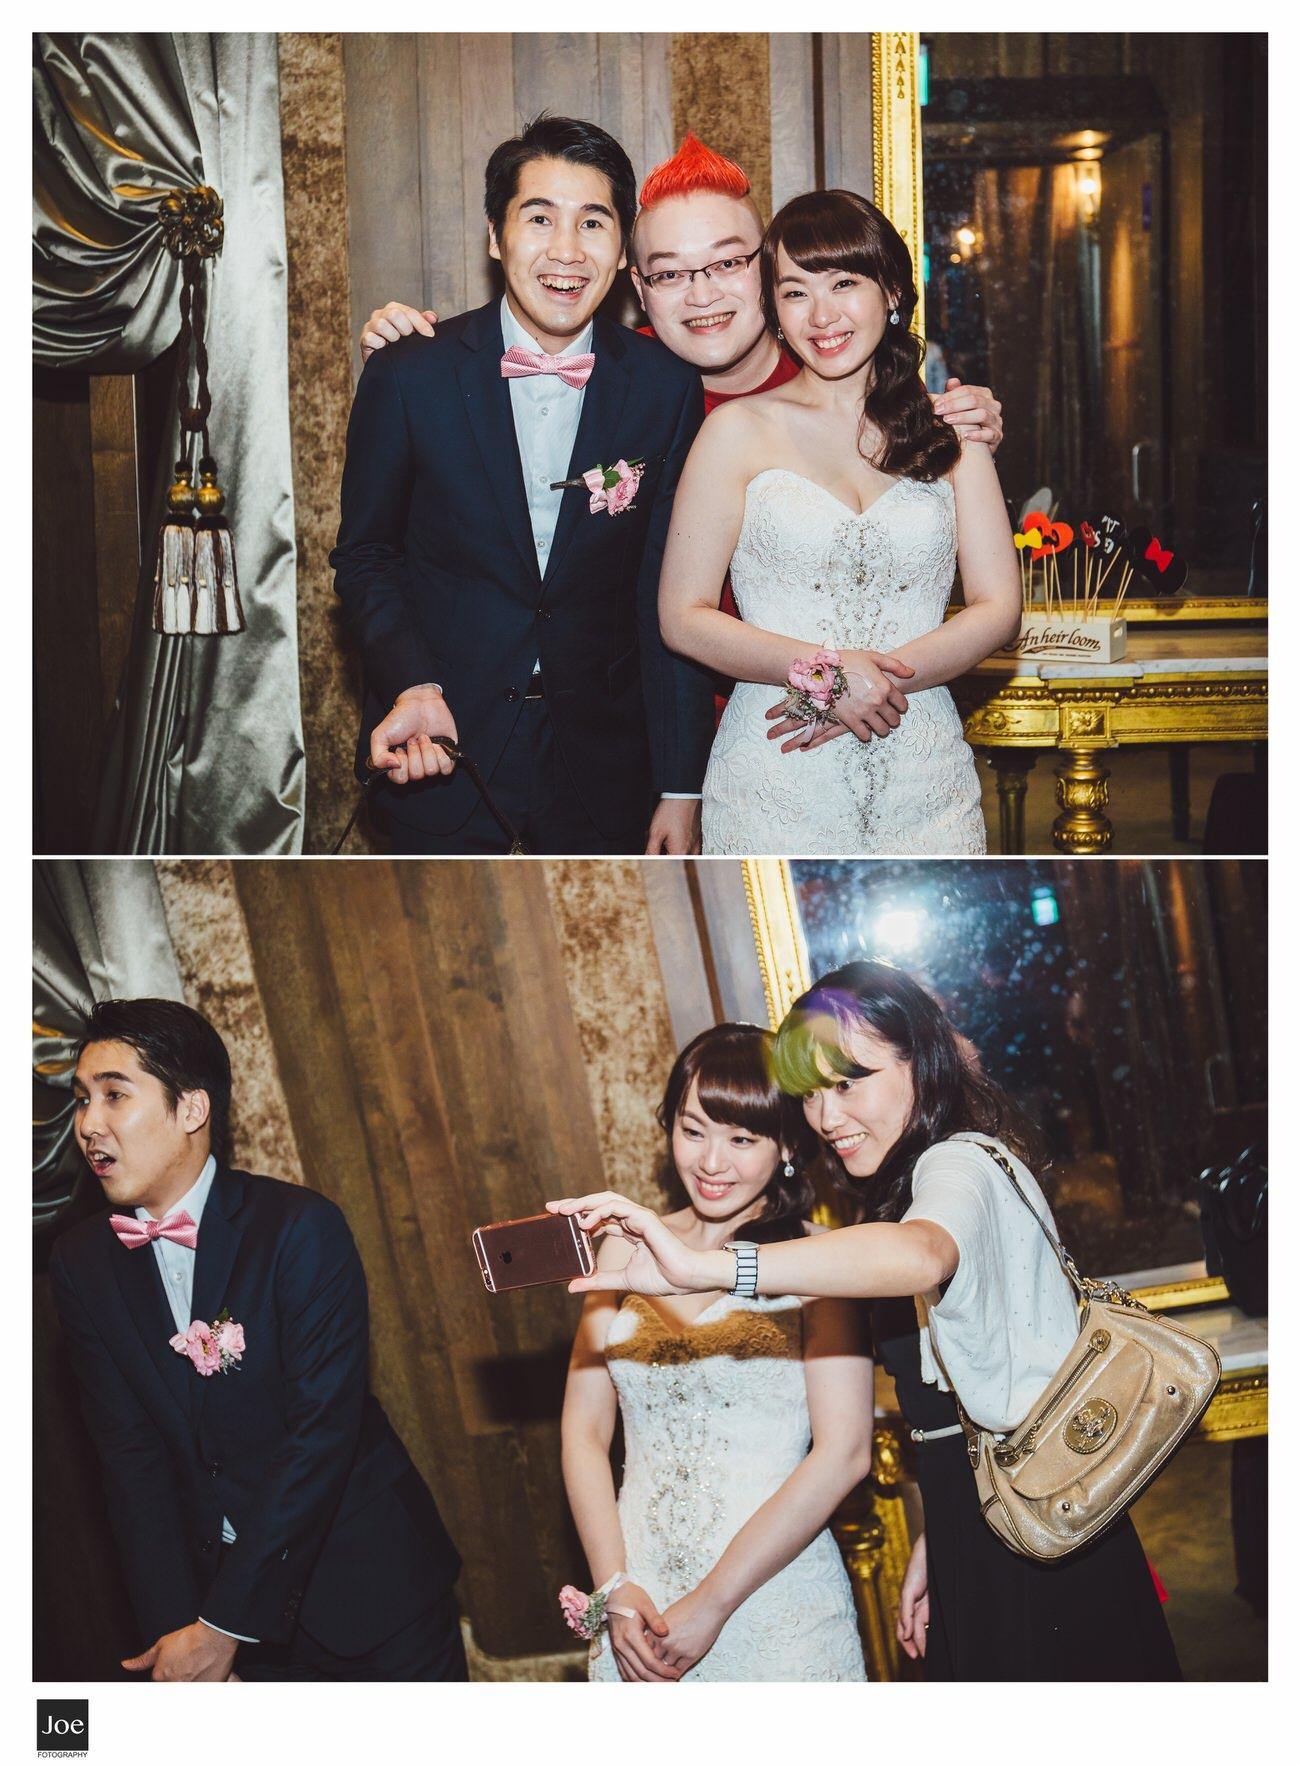 joe-fotography-wedding-photo-palais-de-chine-hotel-063.jpg